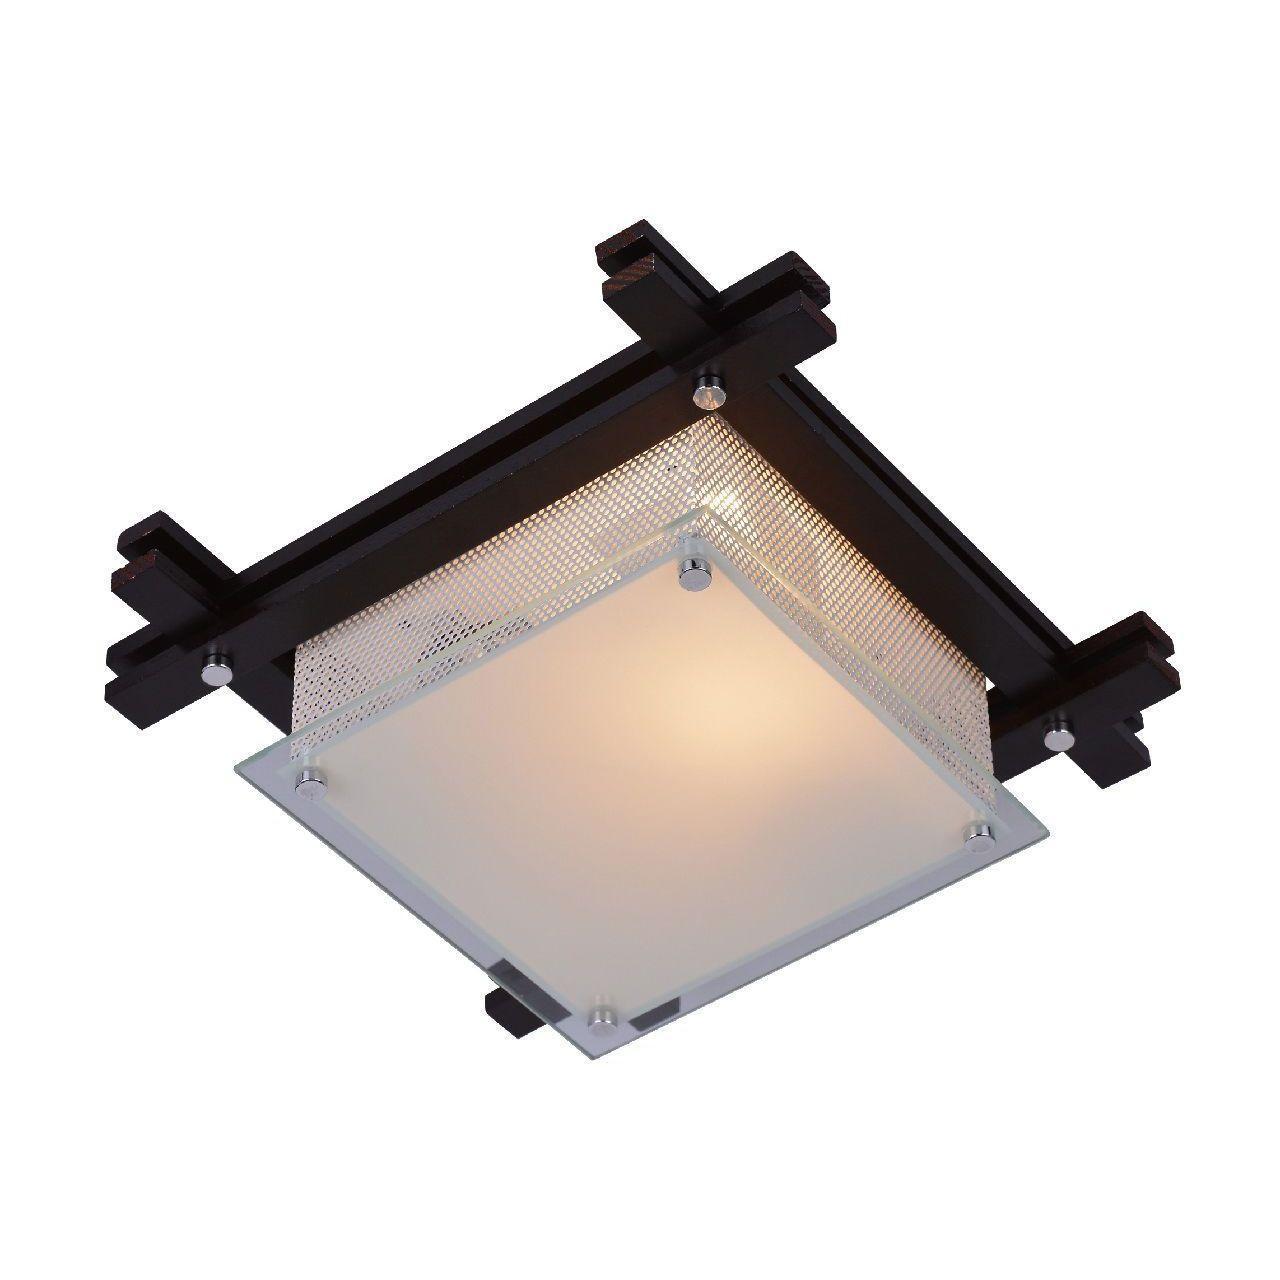 Потолочный светильник Arte Lamp Archimede A6463PL-1BR arte lamp archimede a6460pl 1br